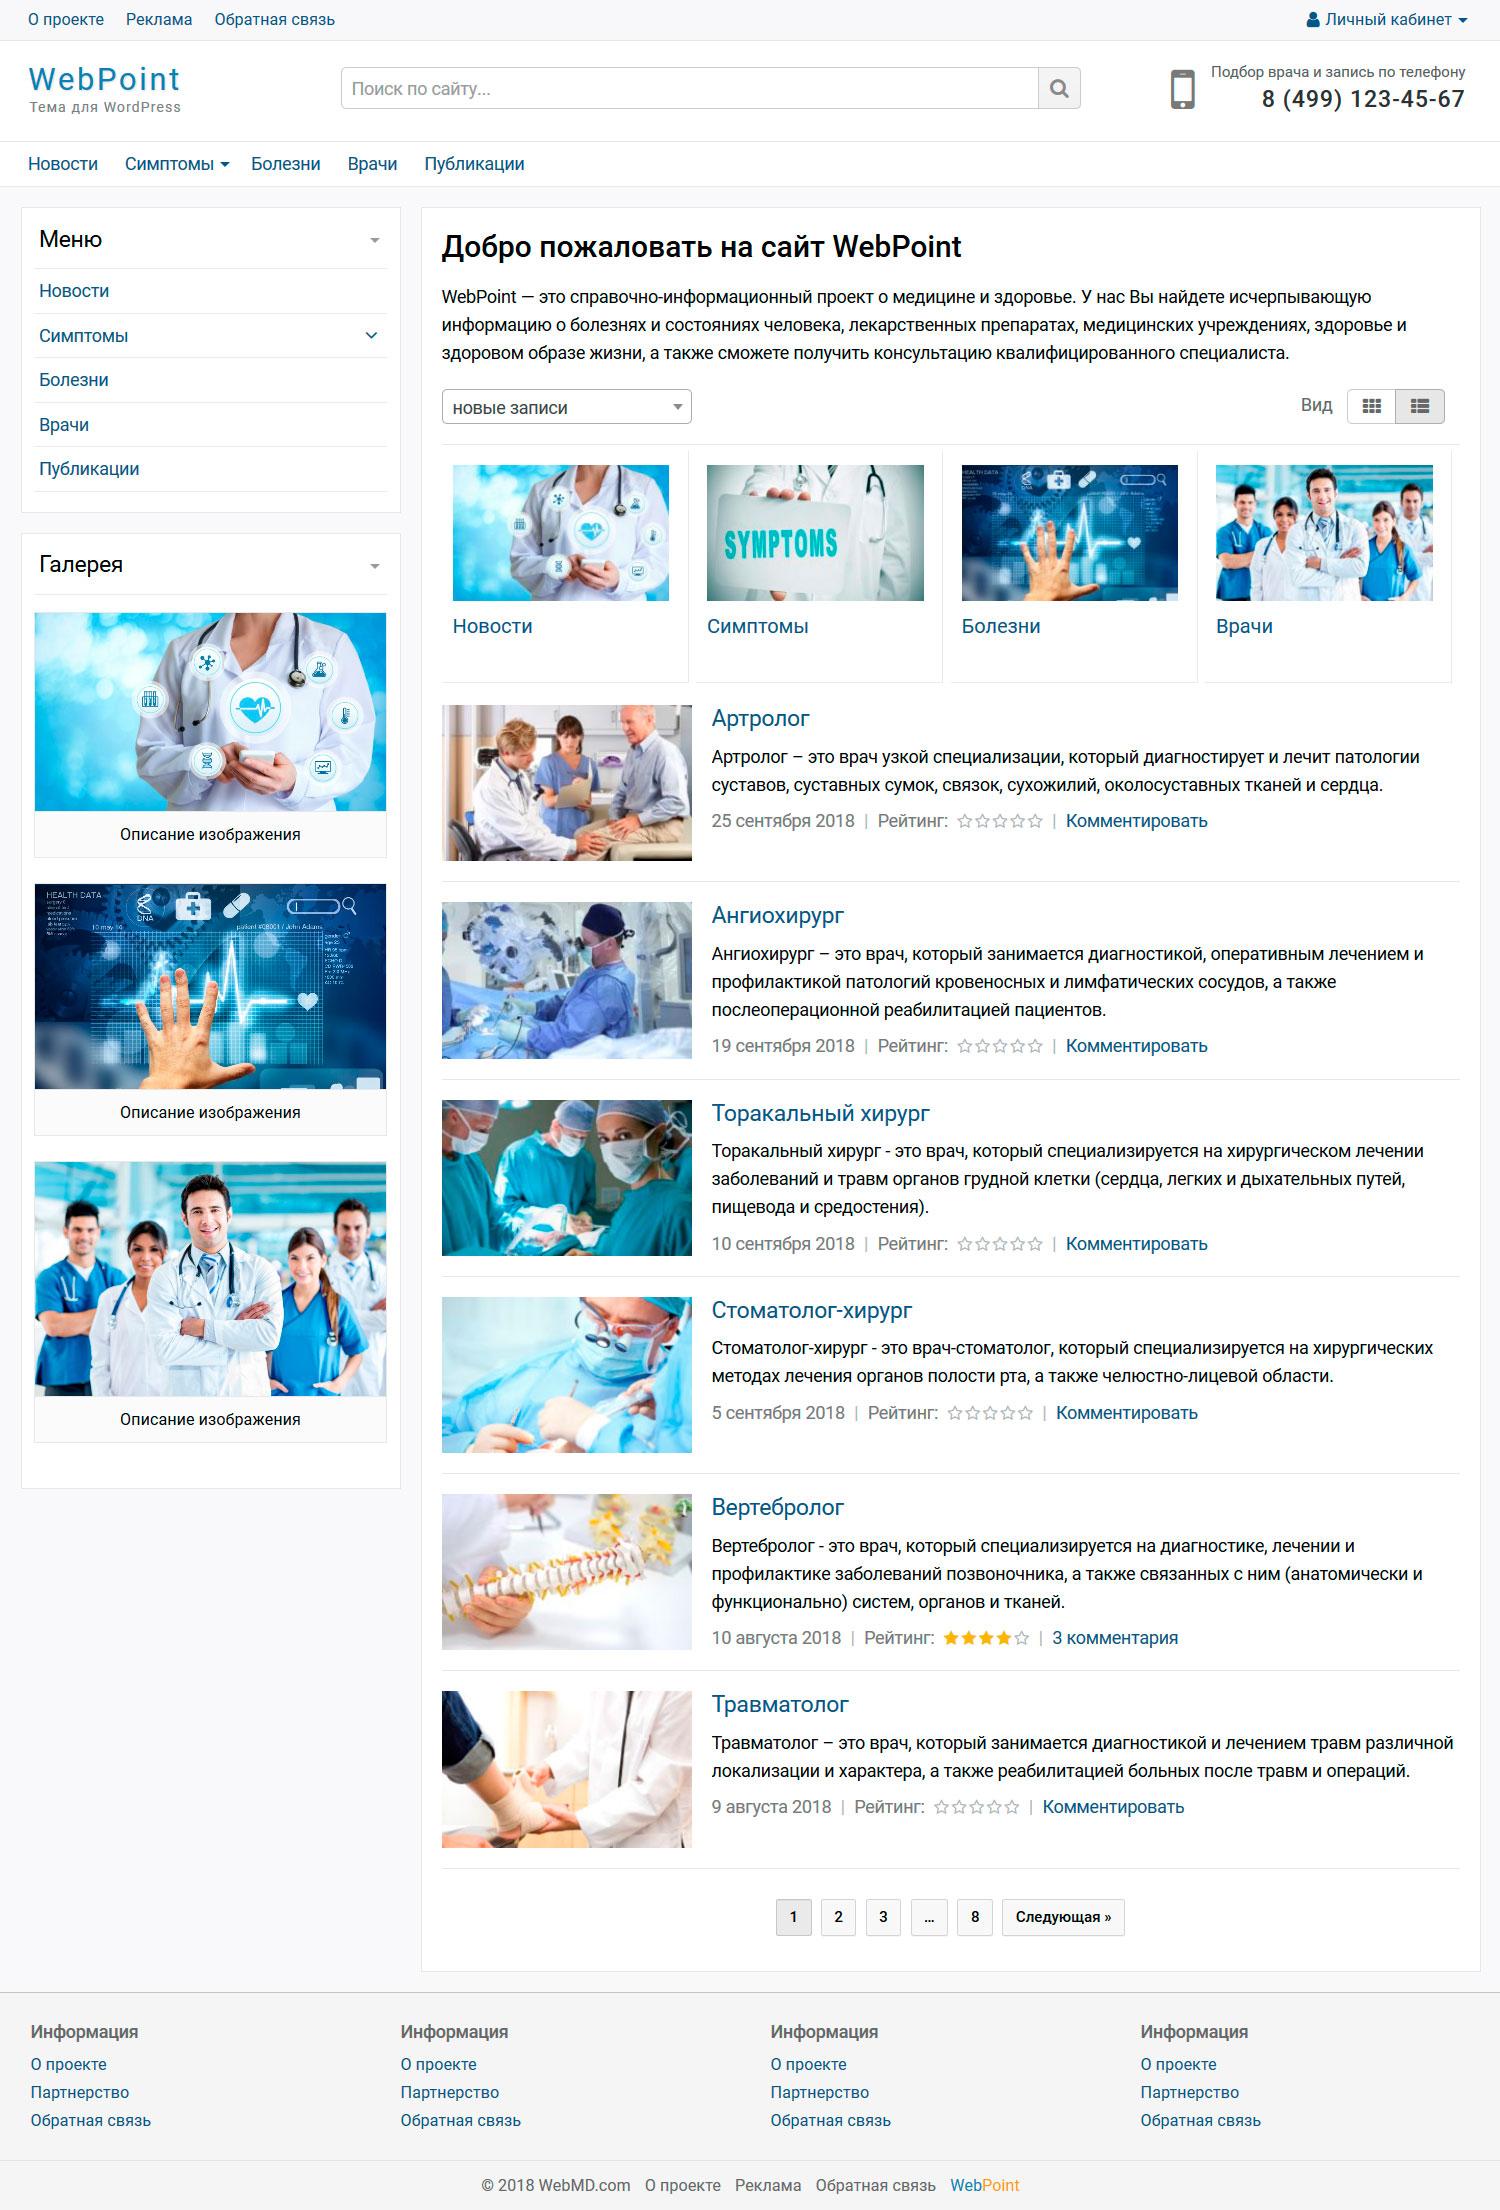 WebPoint PRO - боковая колонка слева